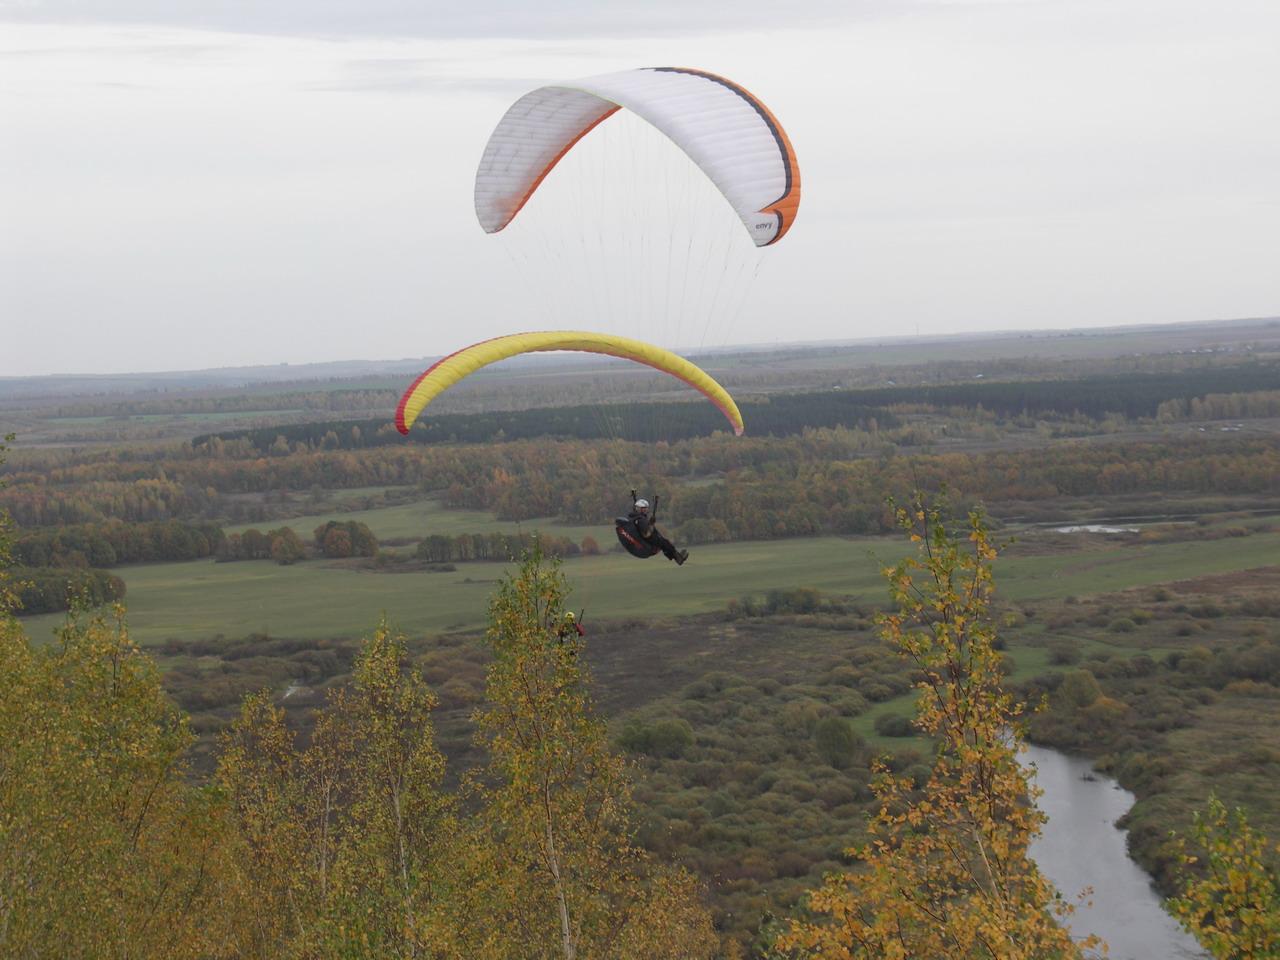 Фото полетов на параплане д чубалово нижегородская обл 5